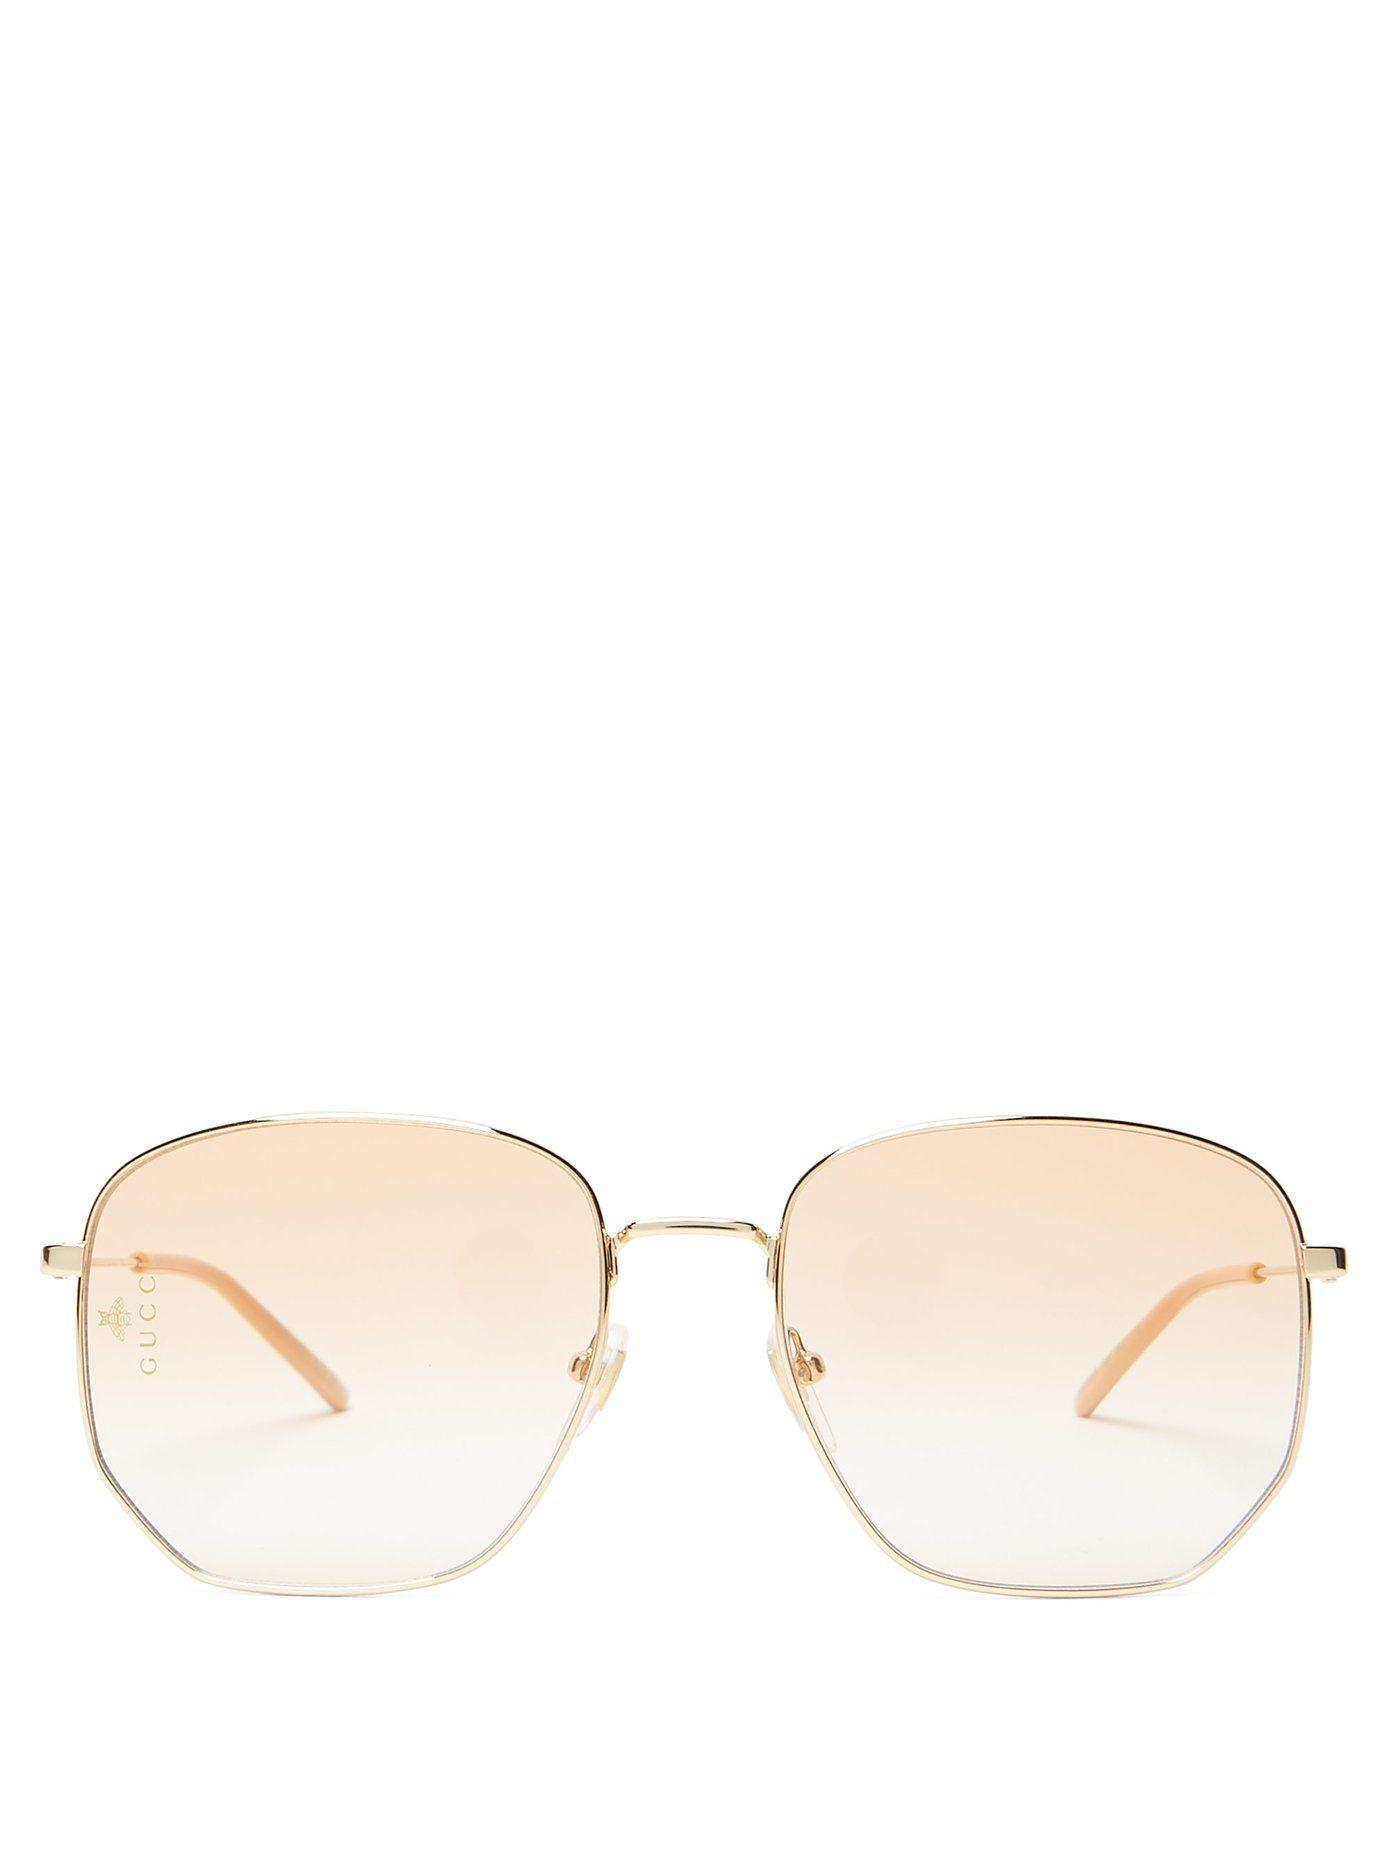 45e525ee5e Square-frame metal glasses